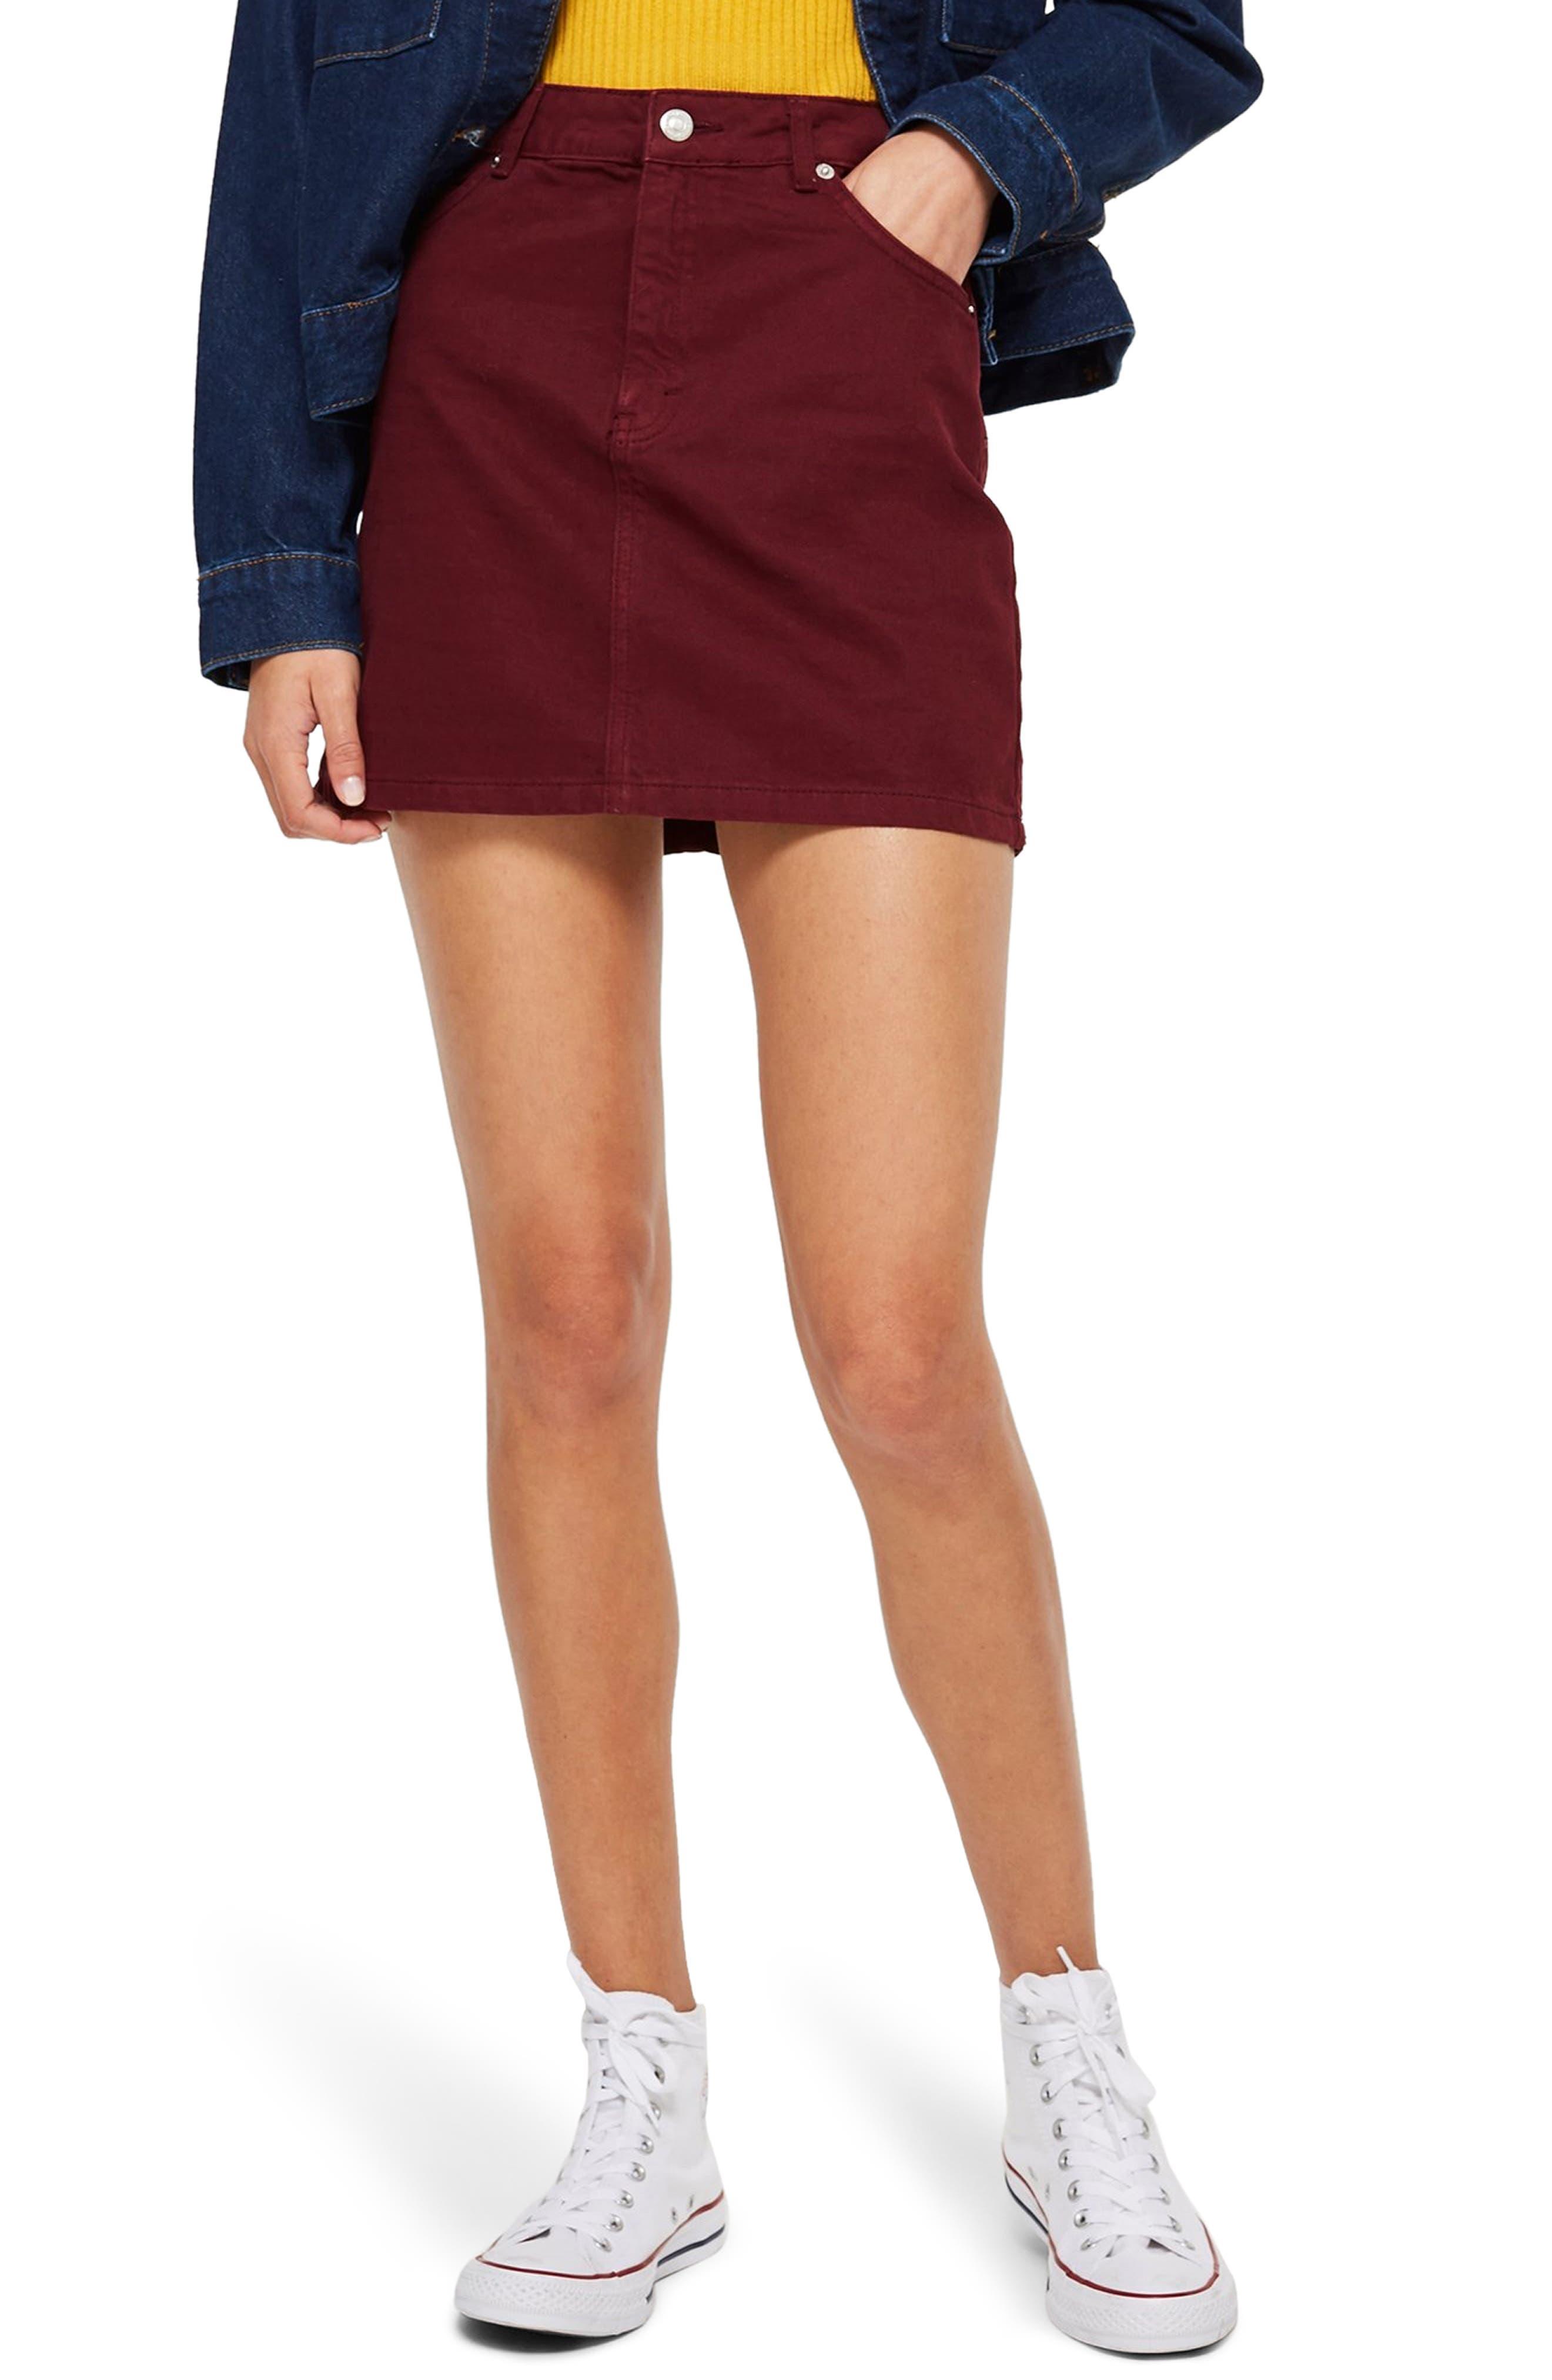 Topshop Bordeaux Denim Skirt, US (fits like 14) - Burgundy